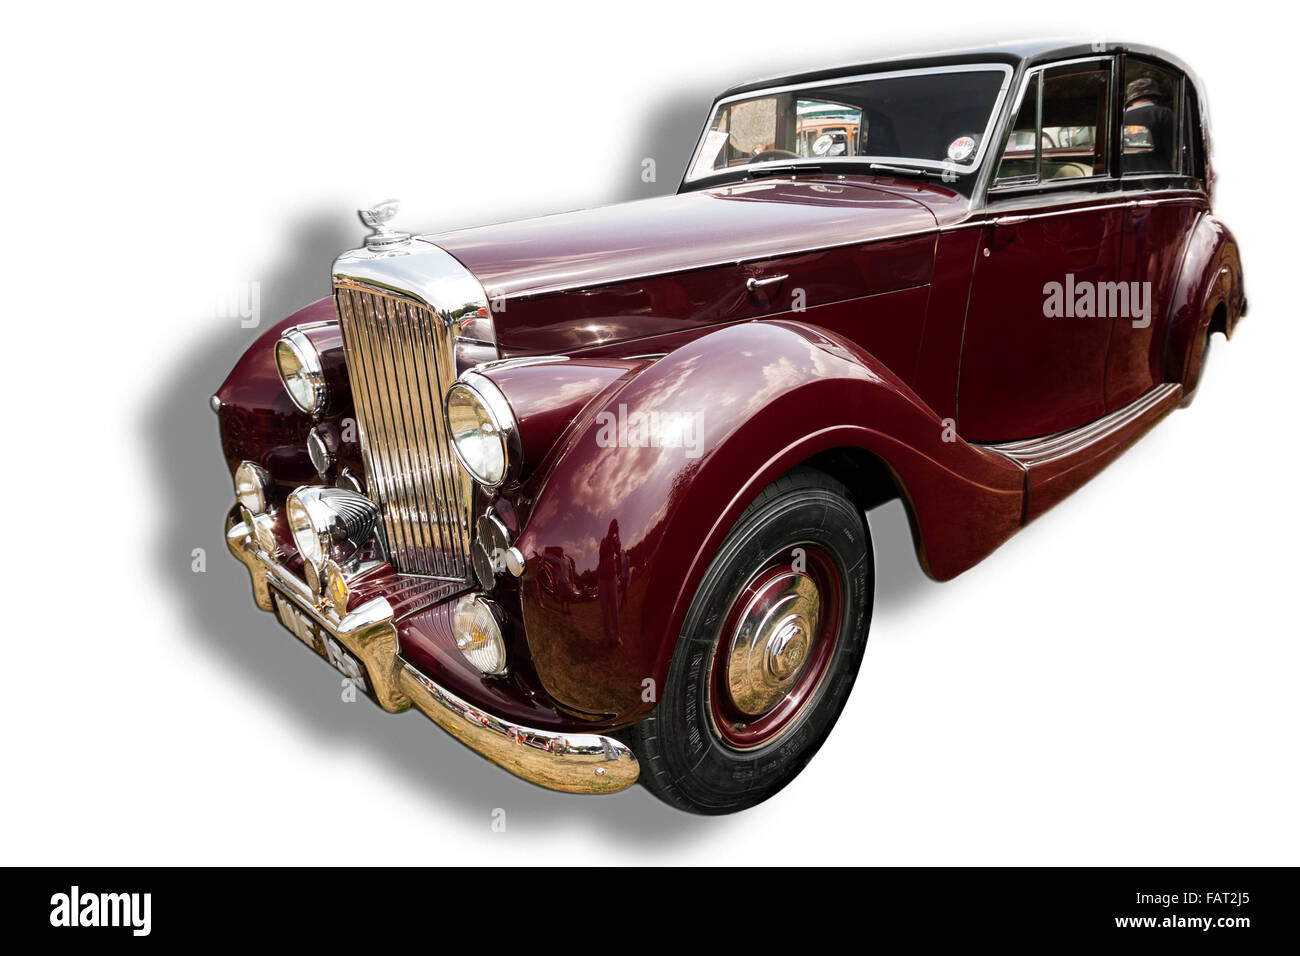 Billericay, Essex, UK - July 2013: Summerfest classic cars show, showed an elegant Bentley vintage model. - Stock Image